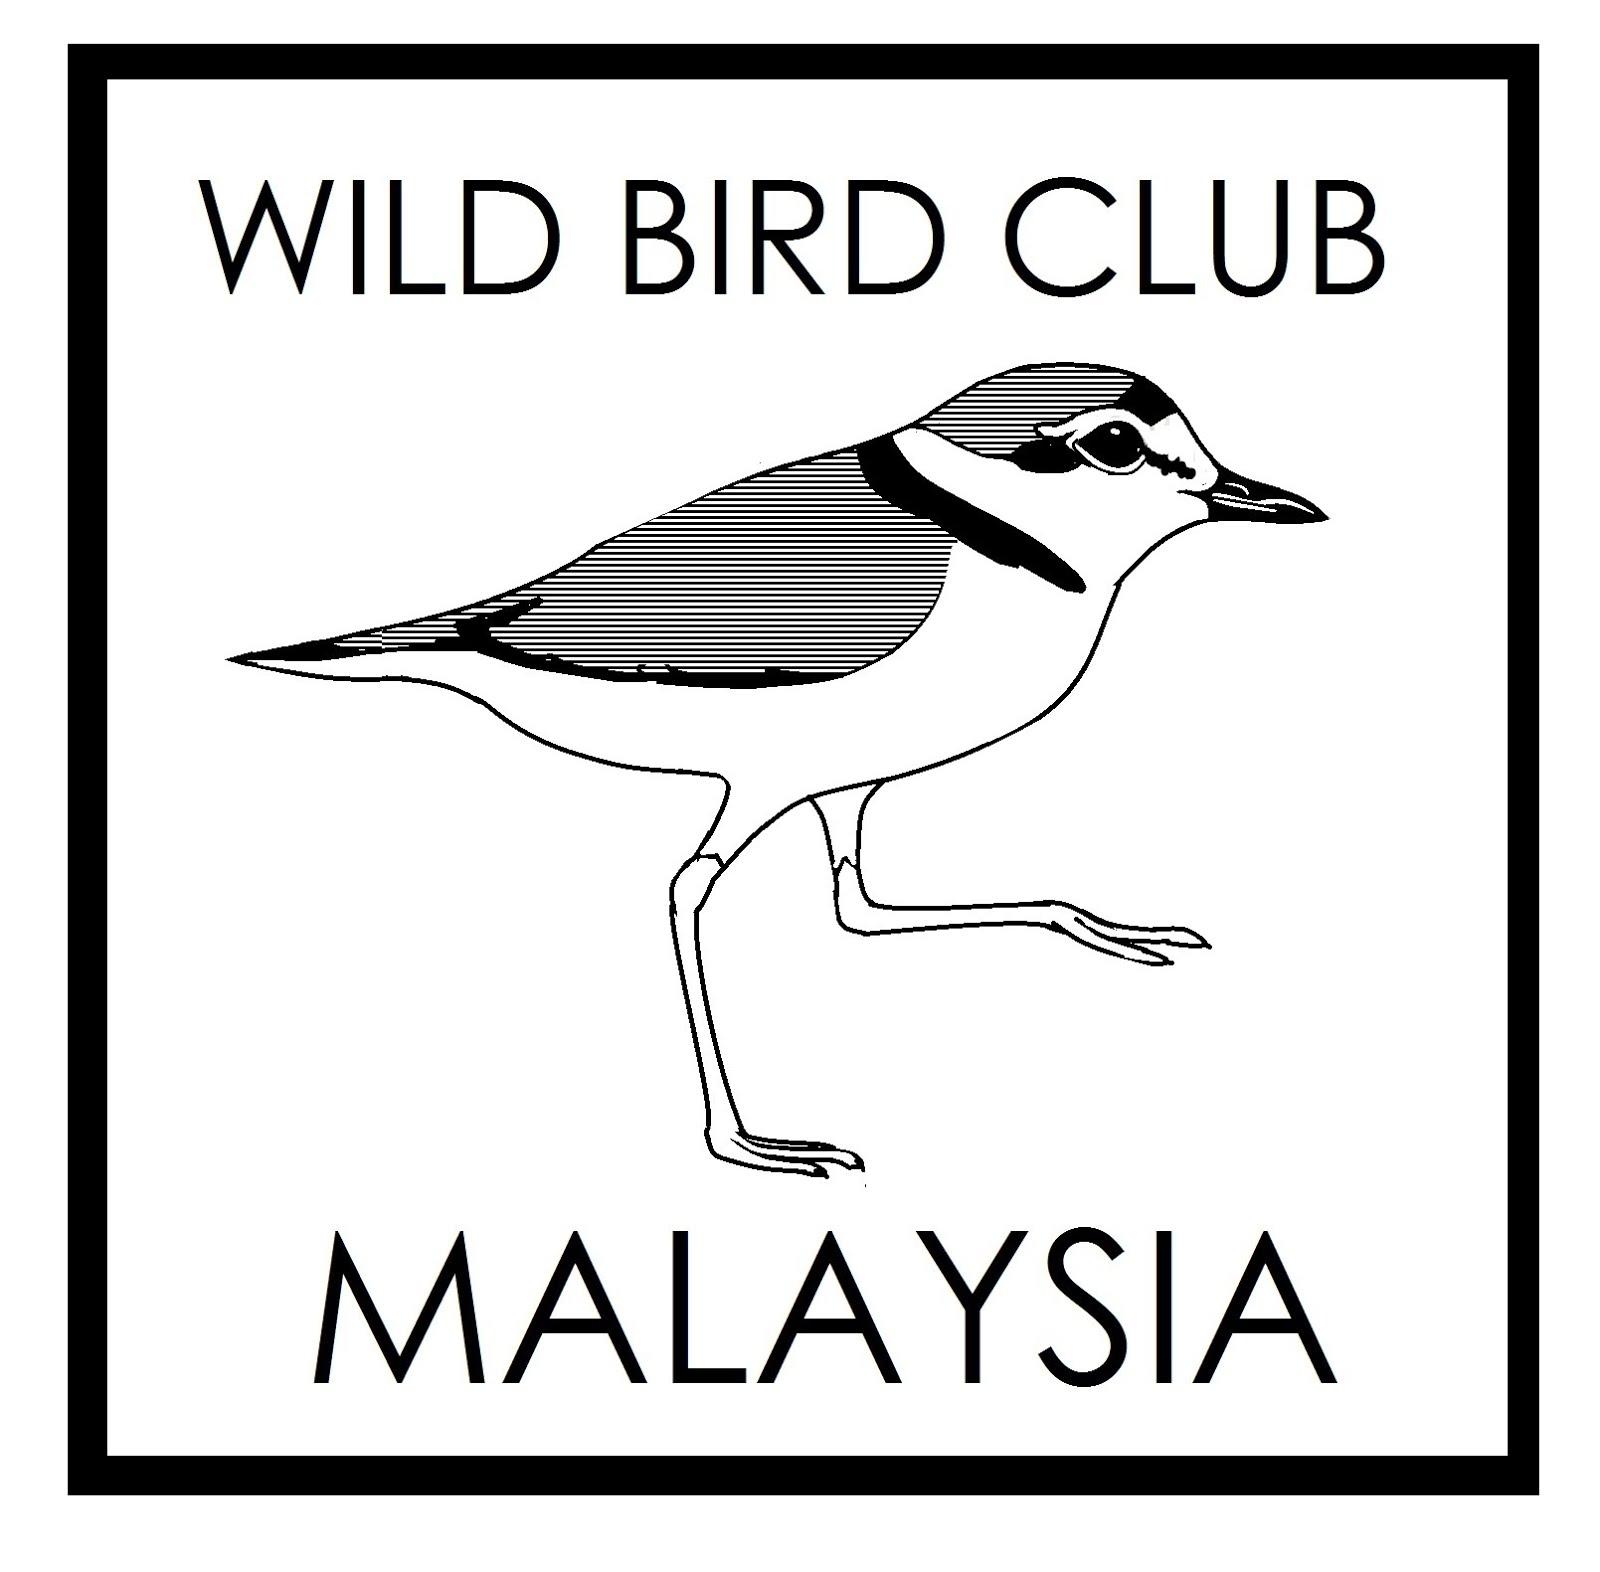 Wild Bird Club Malaysia